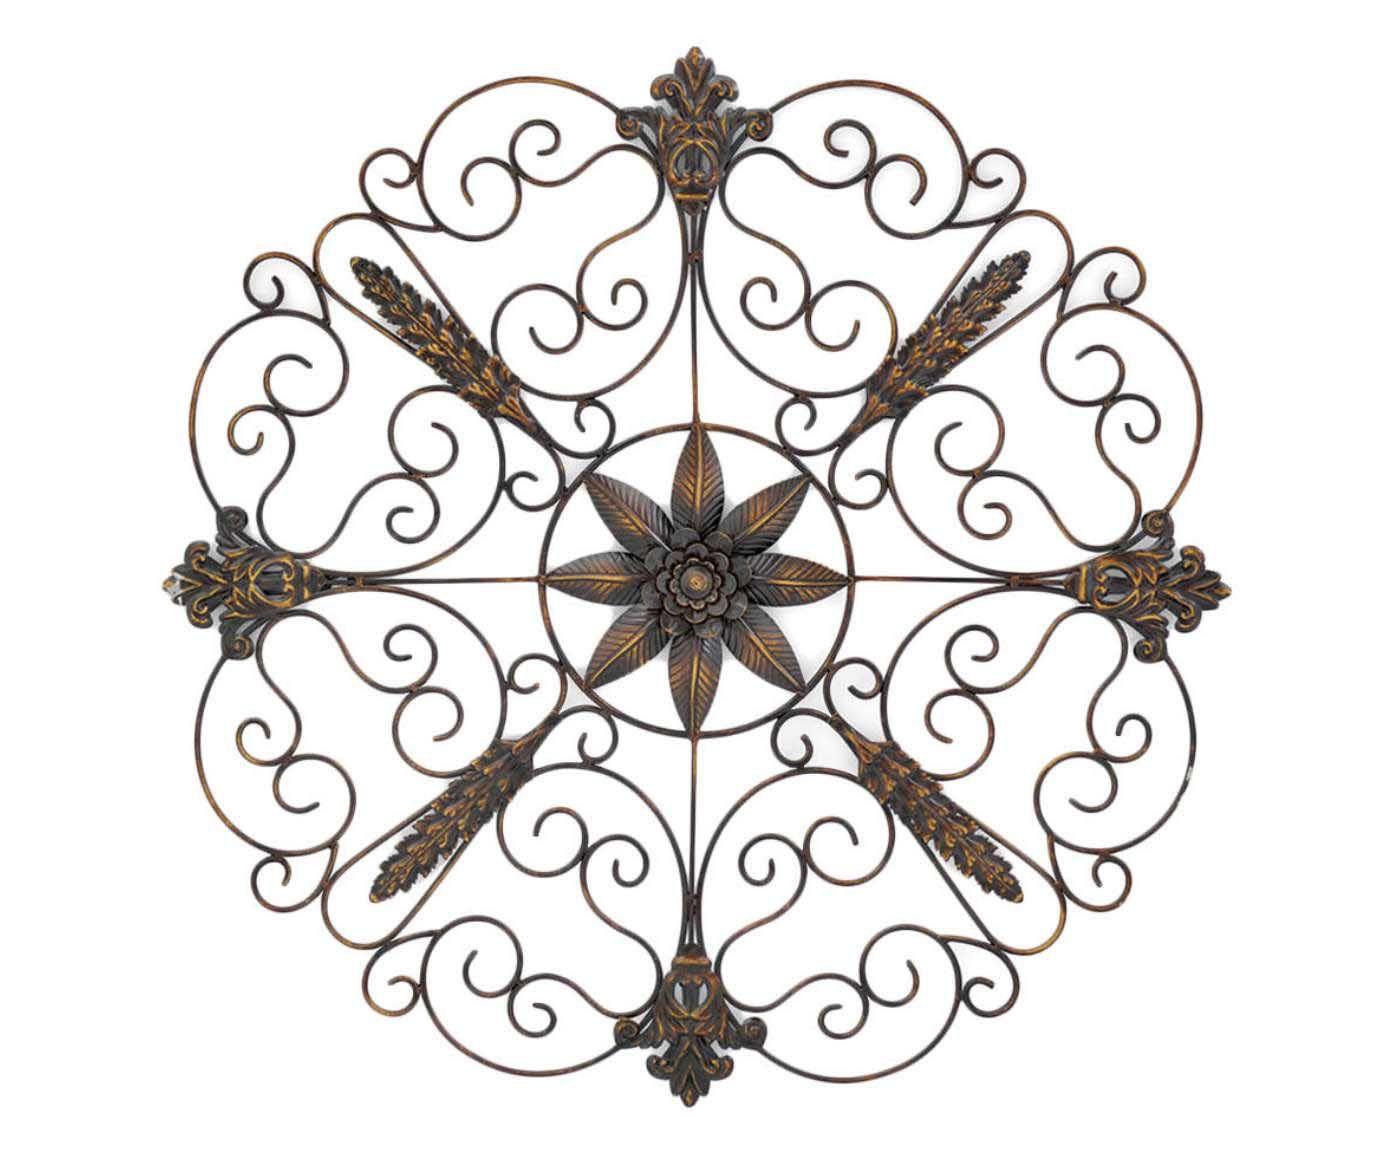 Mandala decorativa ferrine   Westwing.com.br